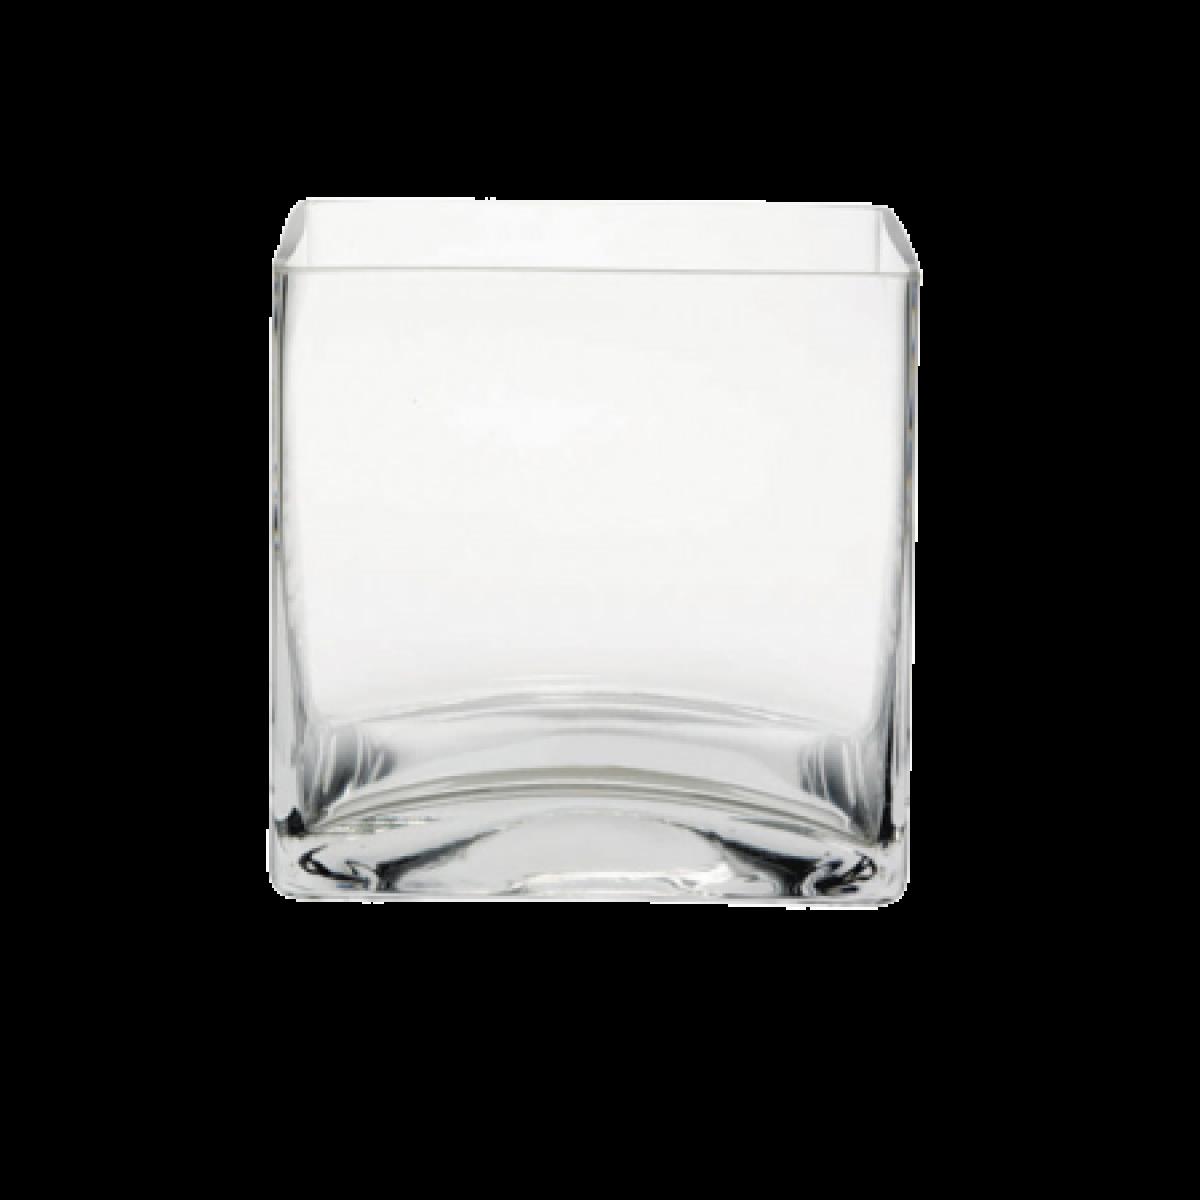 Cube Clear 10x10x10cm Acrylic Vase - 1 No